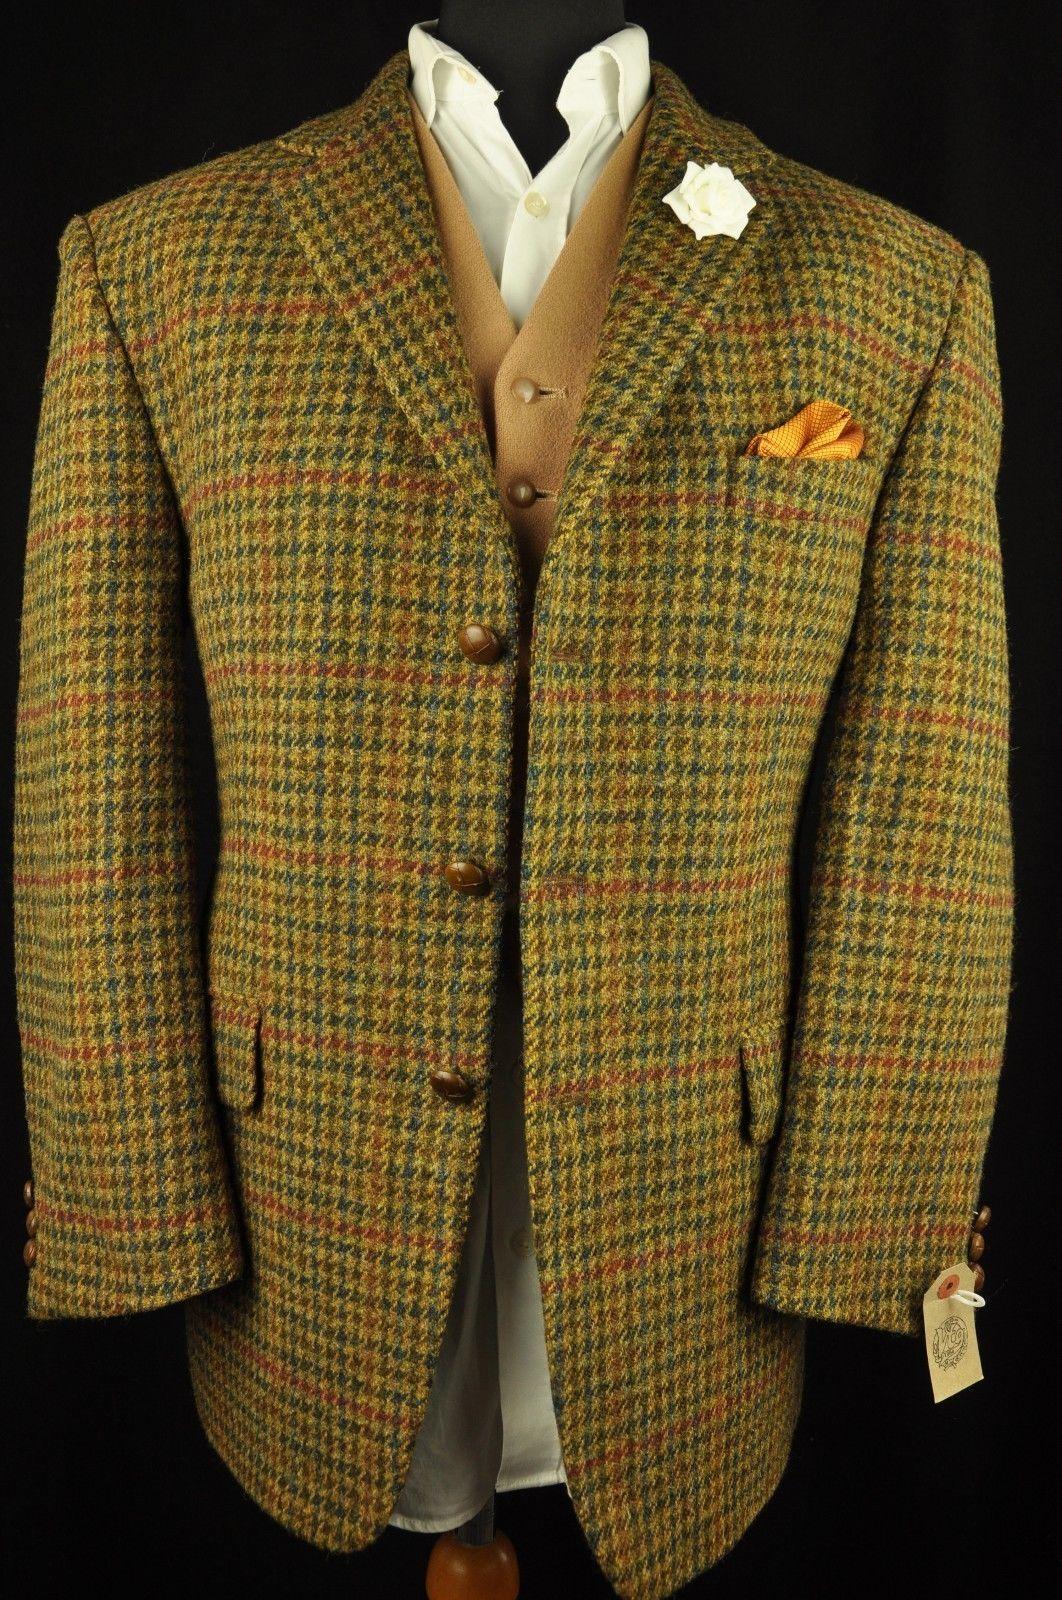 Custom MADE Tweed Sport manteau de la veste blazer, Sur